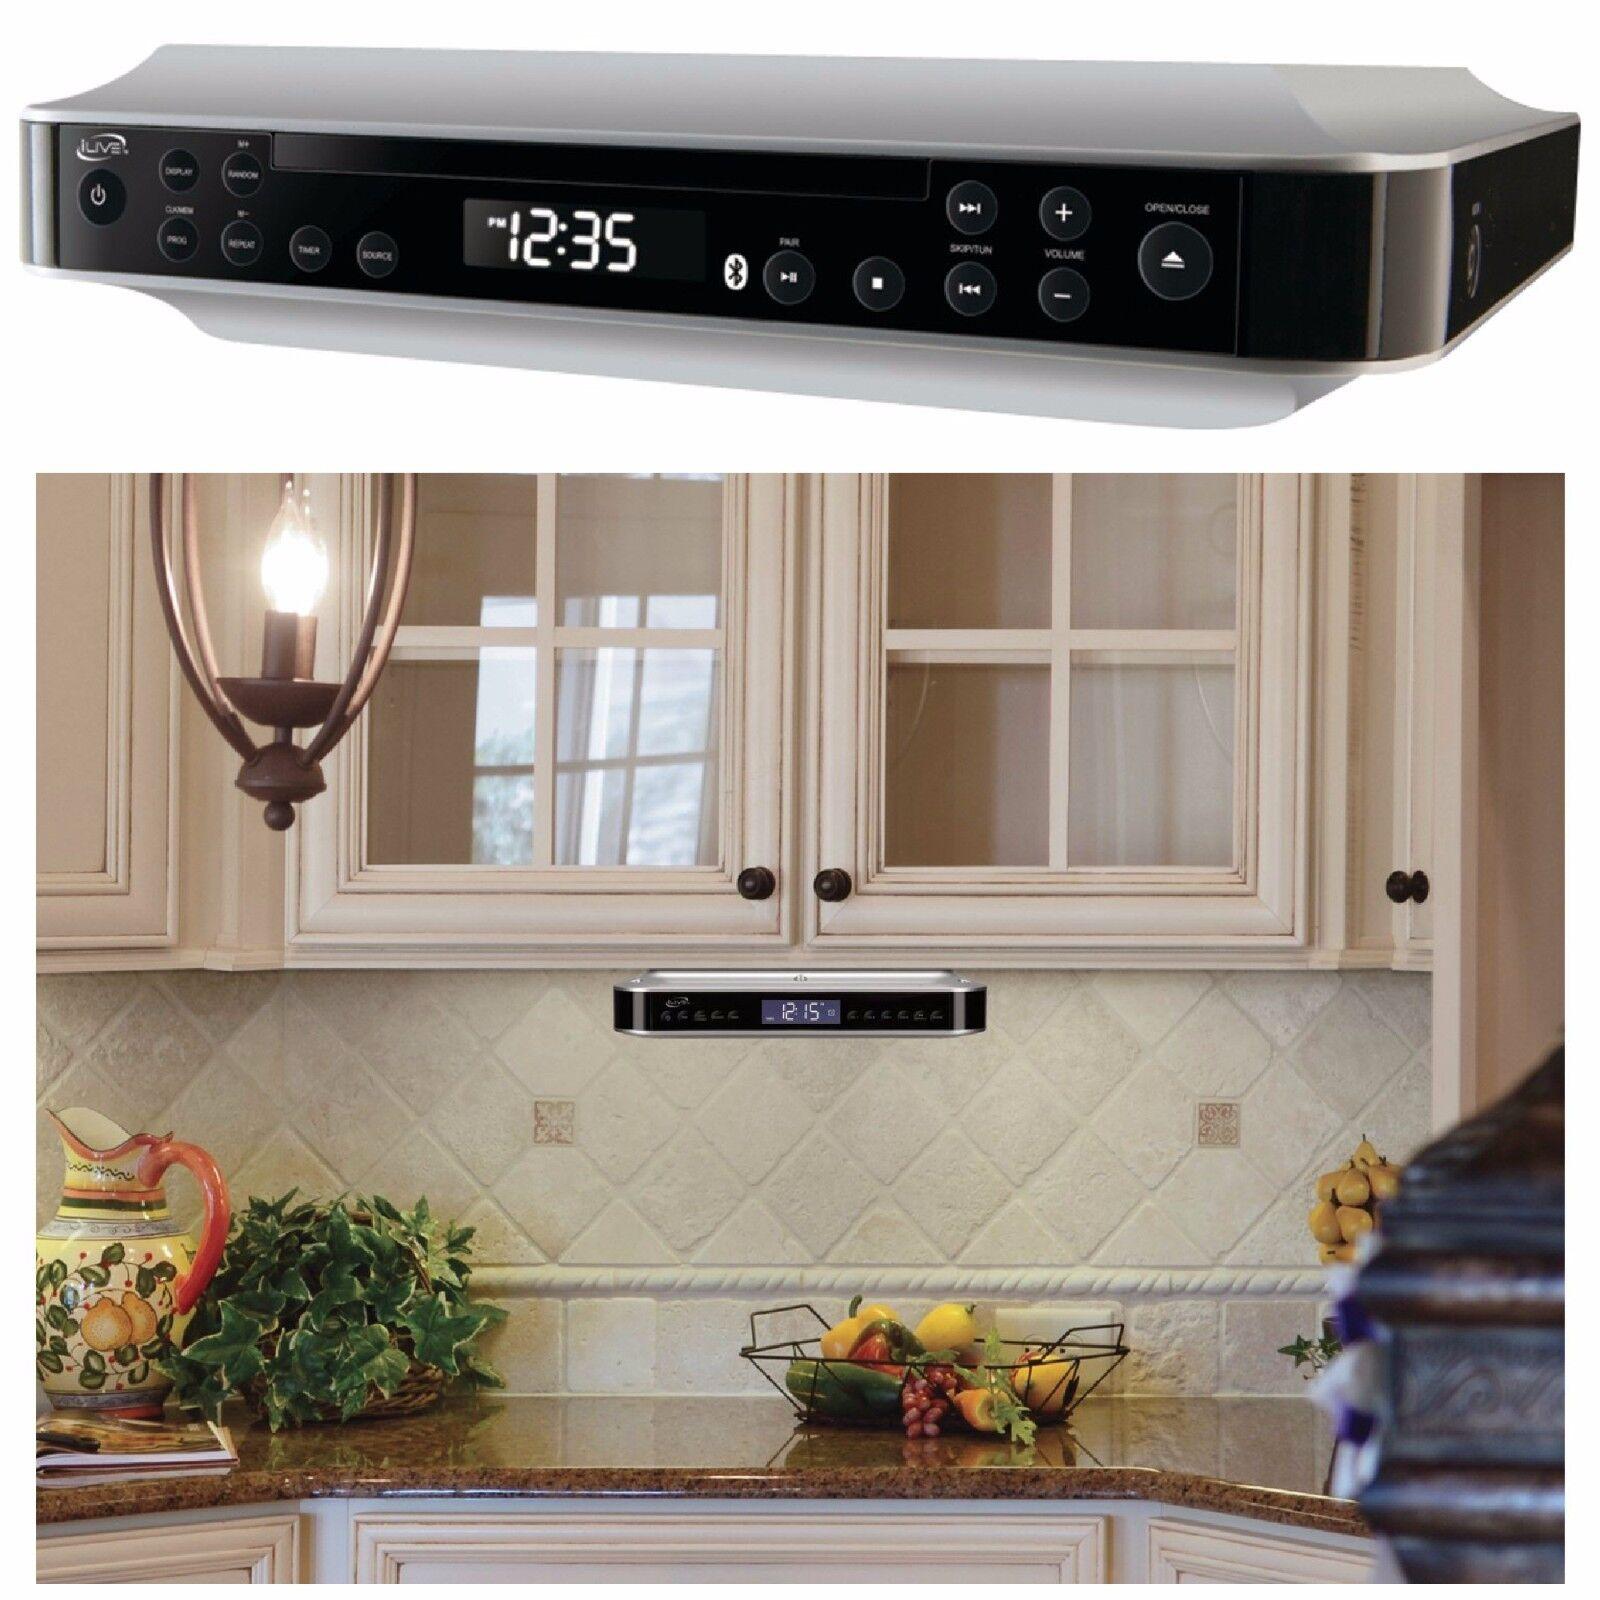 Radio For Kitchen Cabinet: Under Cabinet Cd Player And Radio Kitchen Counter